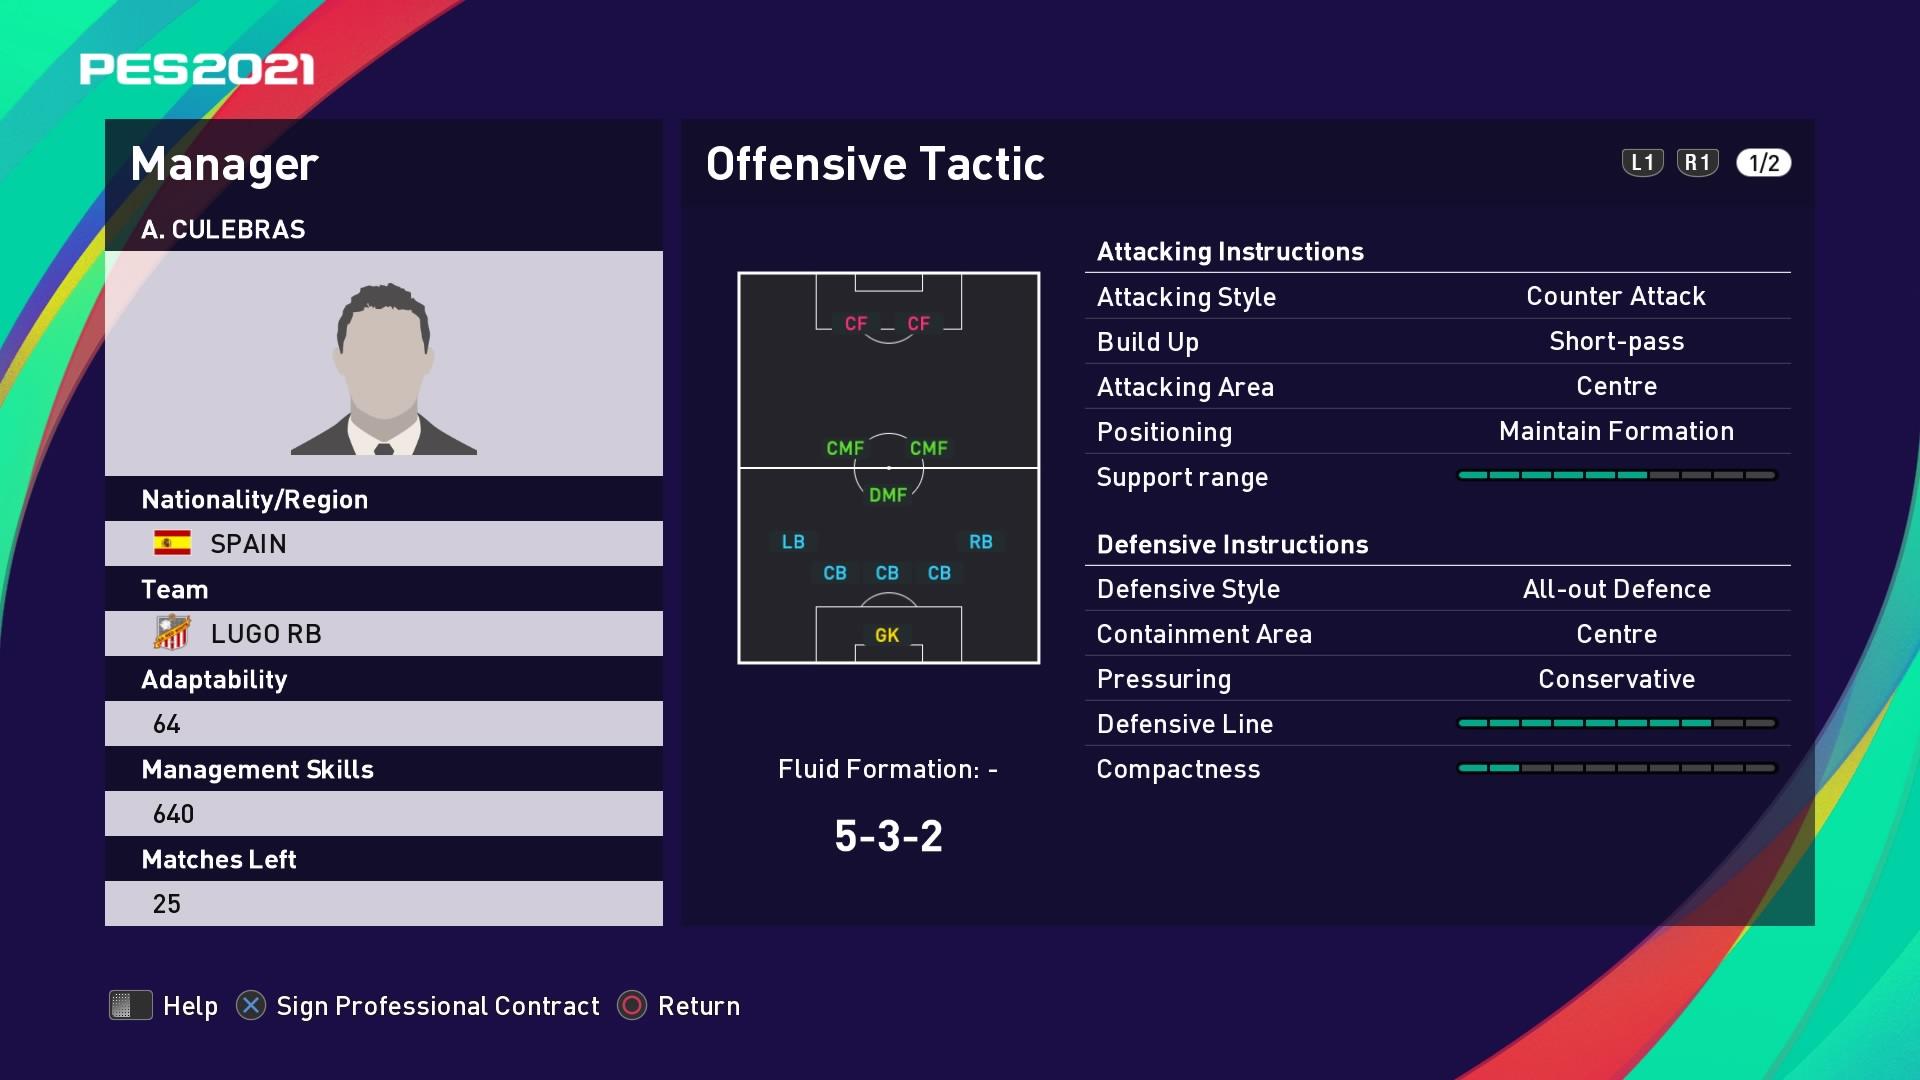 A. Culebras (Juanfran) Offensive Tactic in PES 2021 myClub